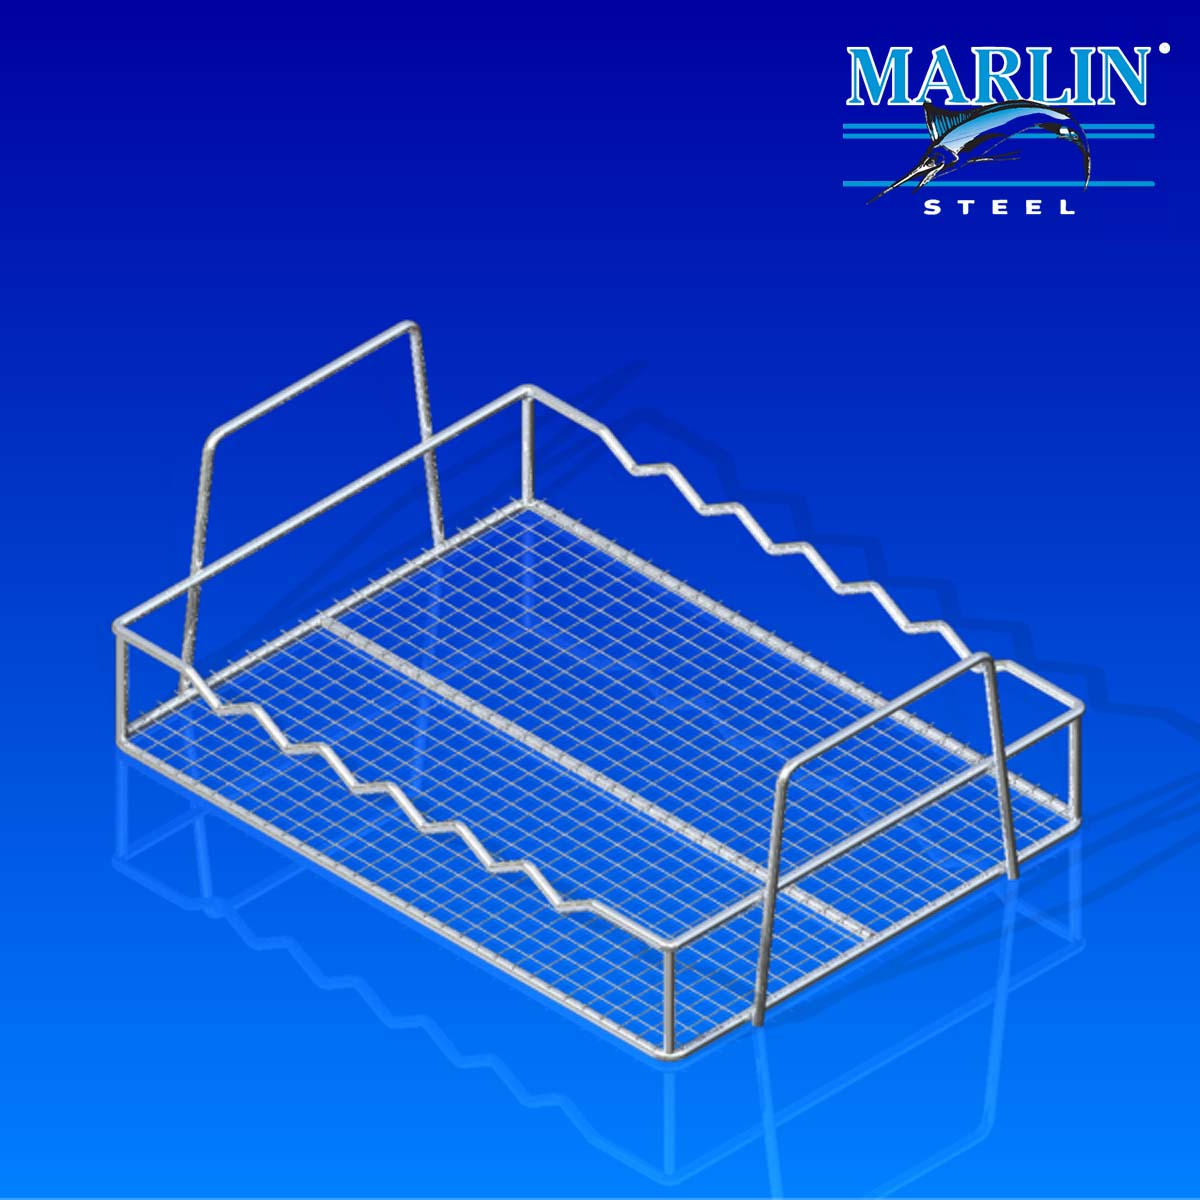 Marlin Steel Basket with Handles 854001